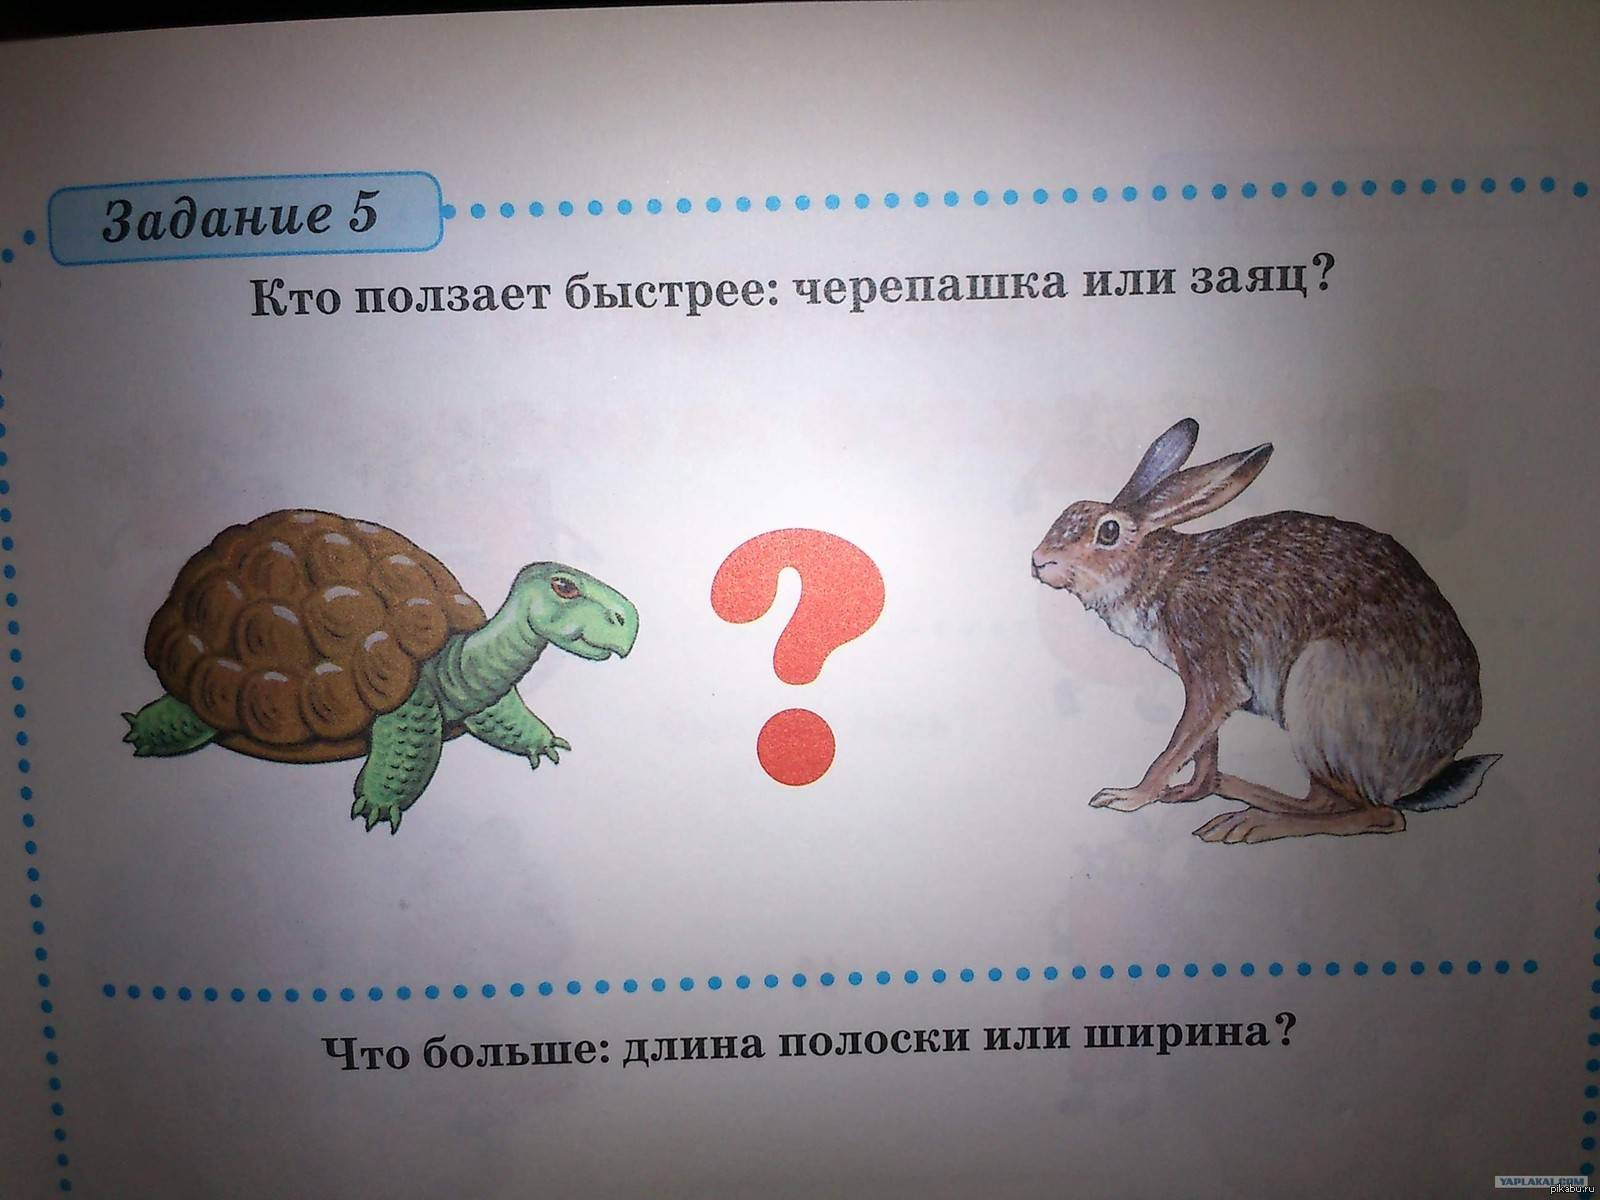 Загадка про ахиллеса и черепаху